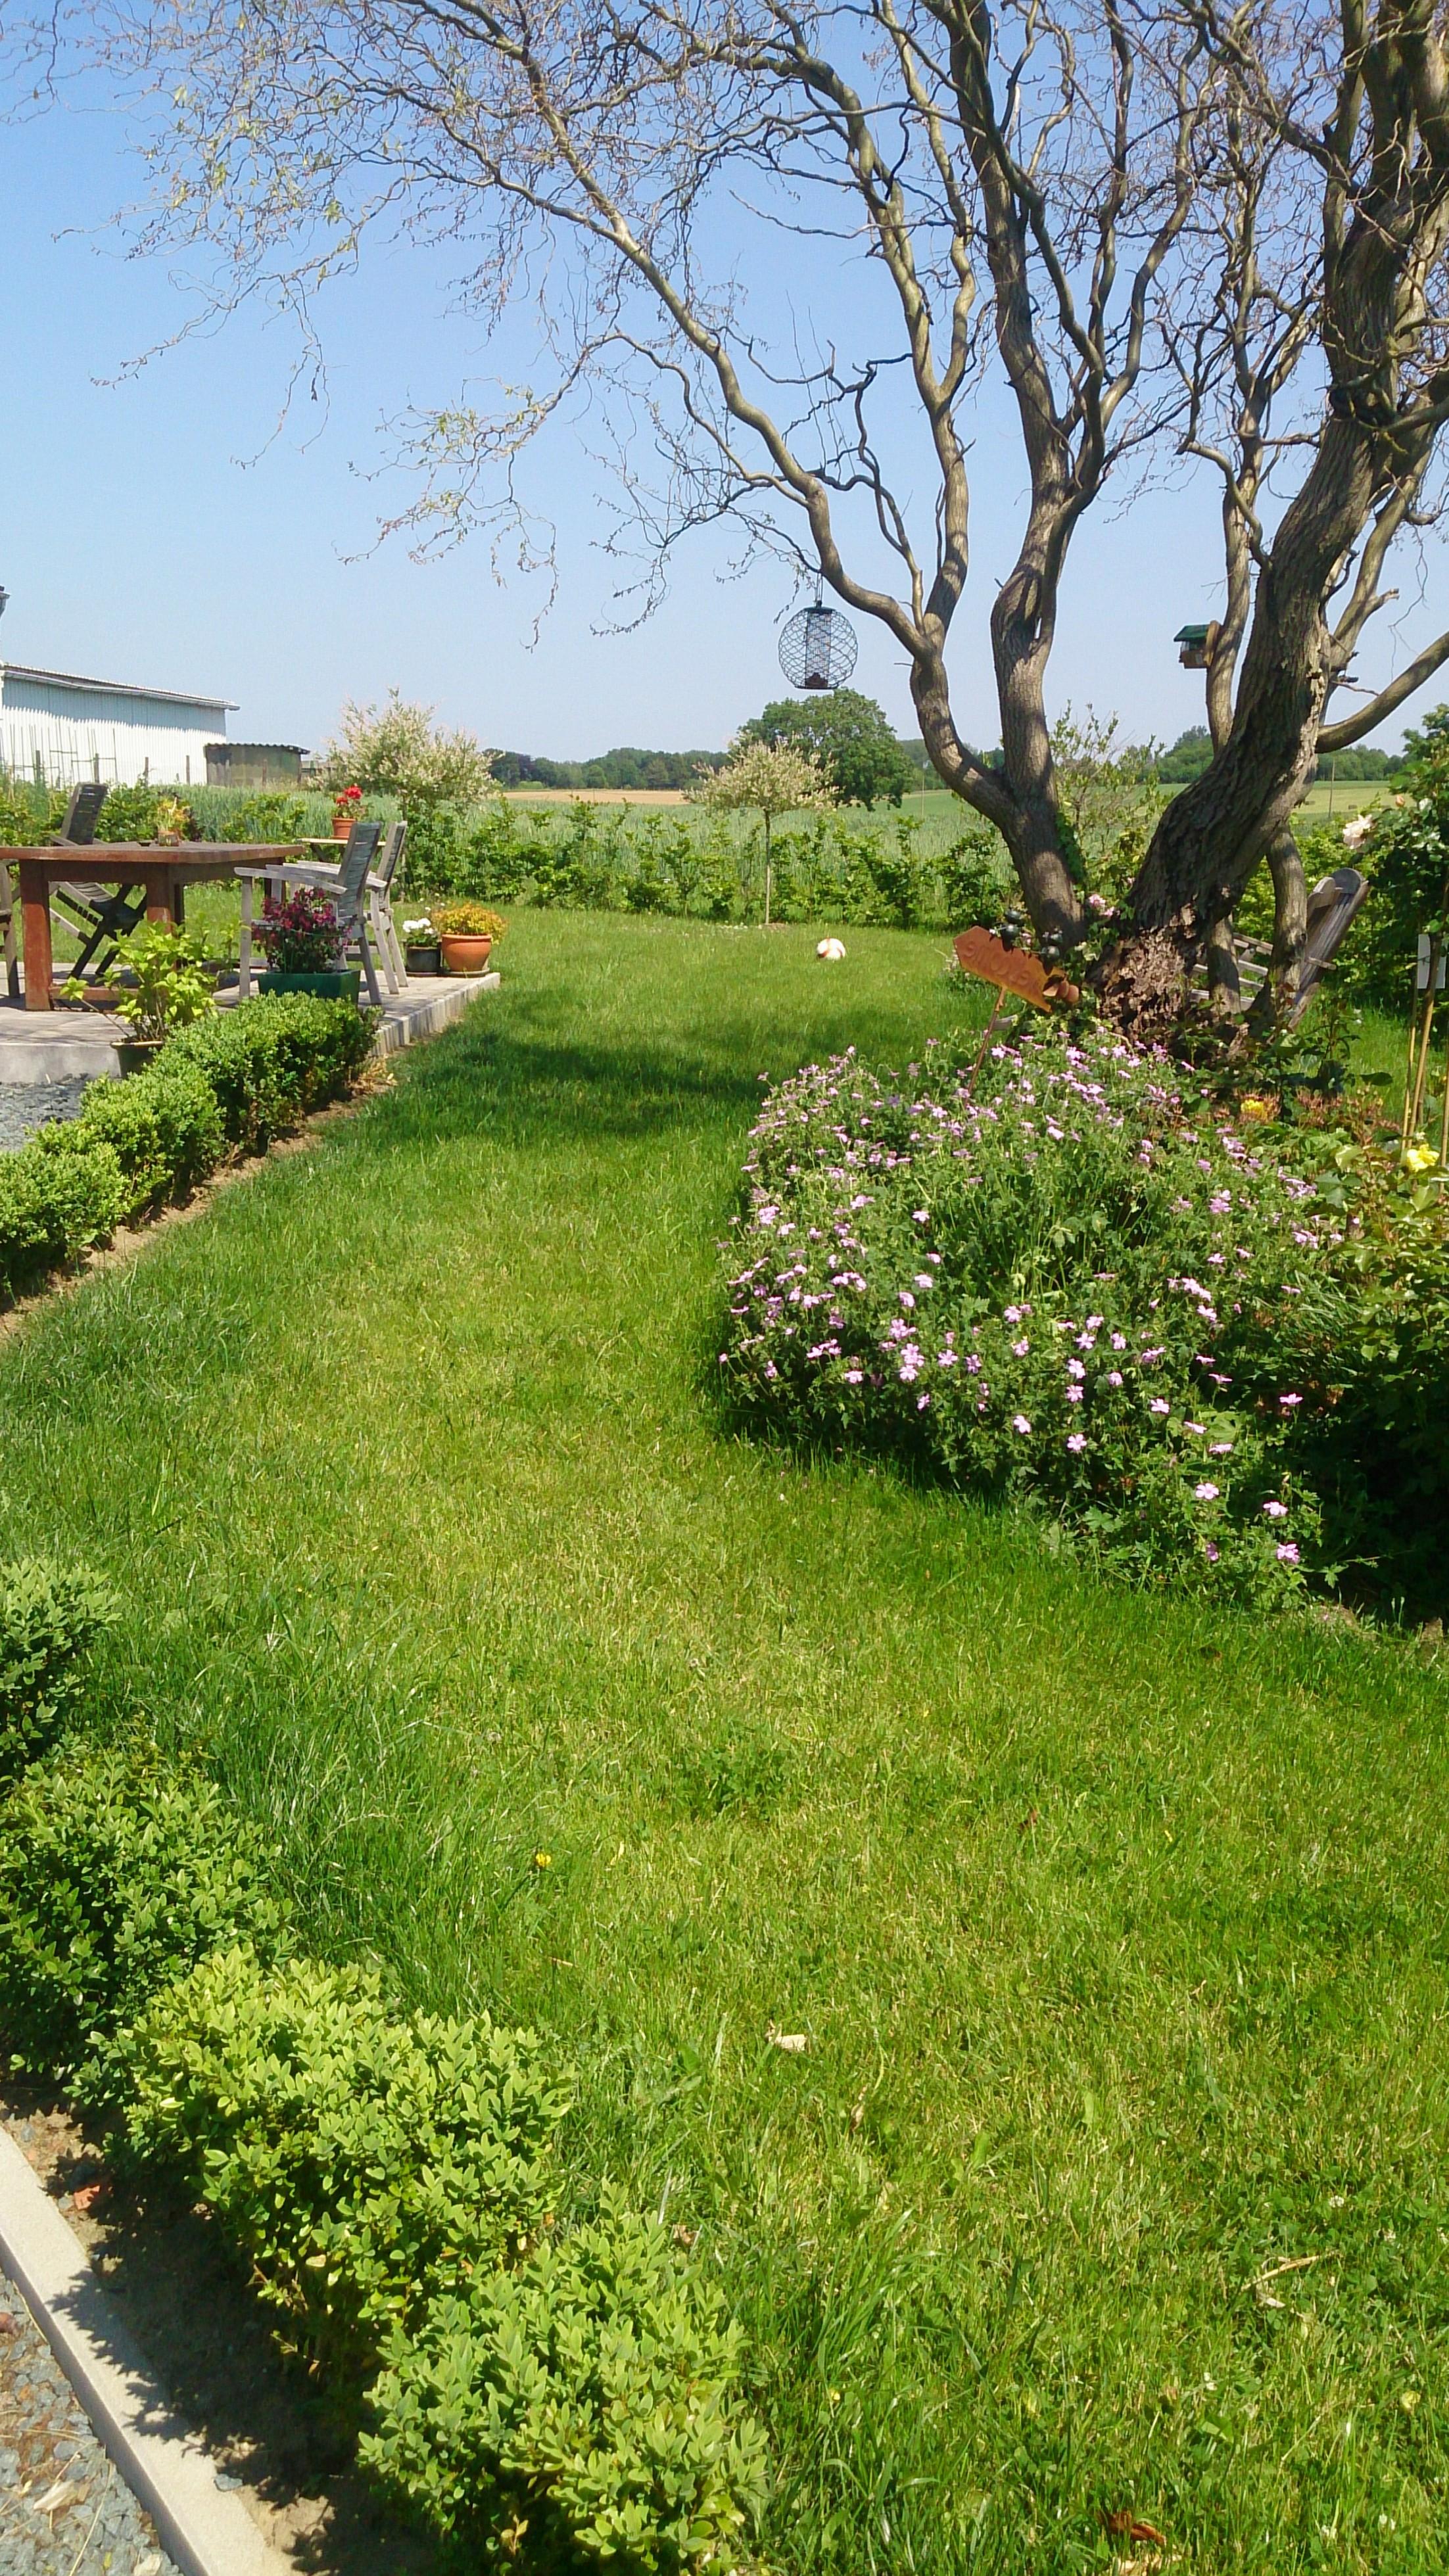 exemple de jardin cheap amnagement patio extrieur with exemple de jardin exemple de jardin zen. Black Bedroom Furniture Sets. Home Design Ideas